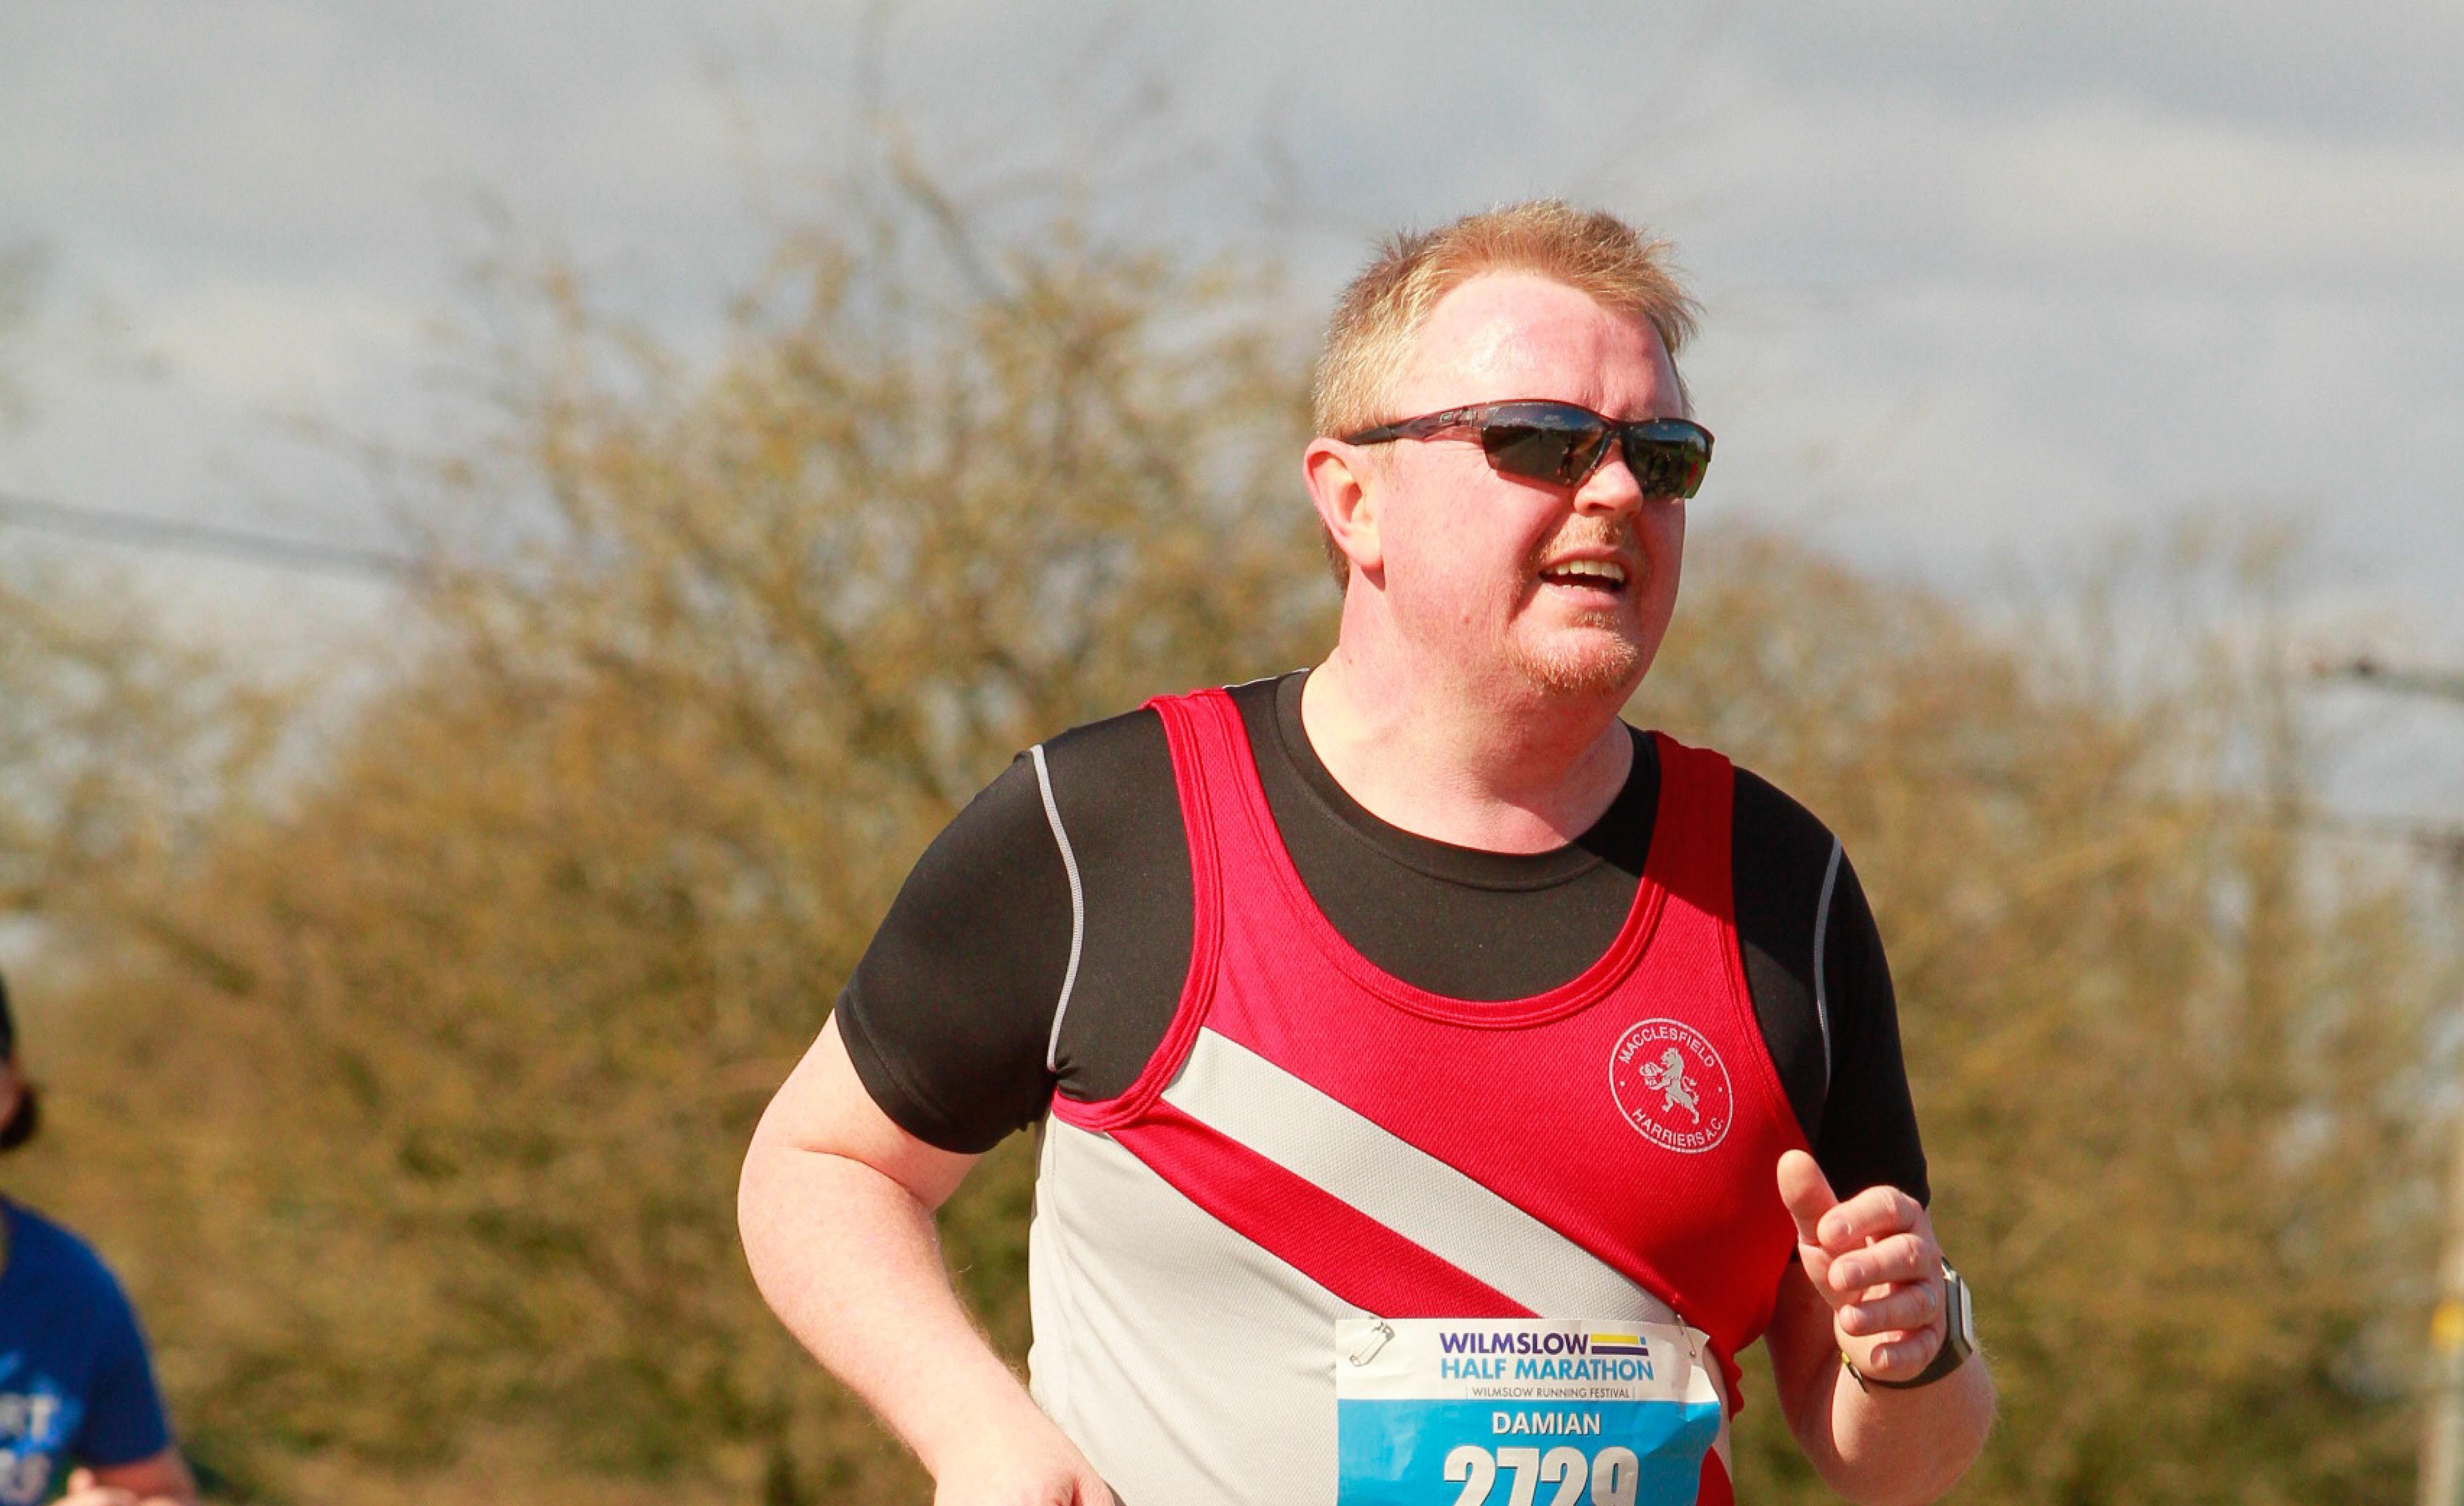 Damian Lacey's Marathon